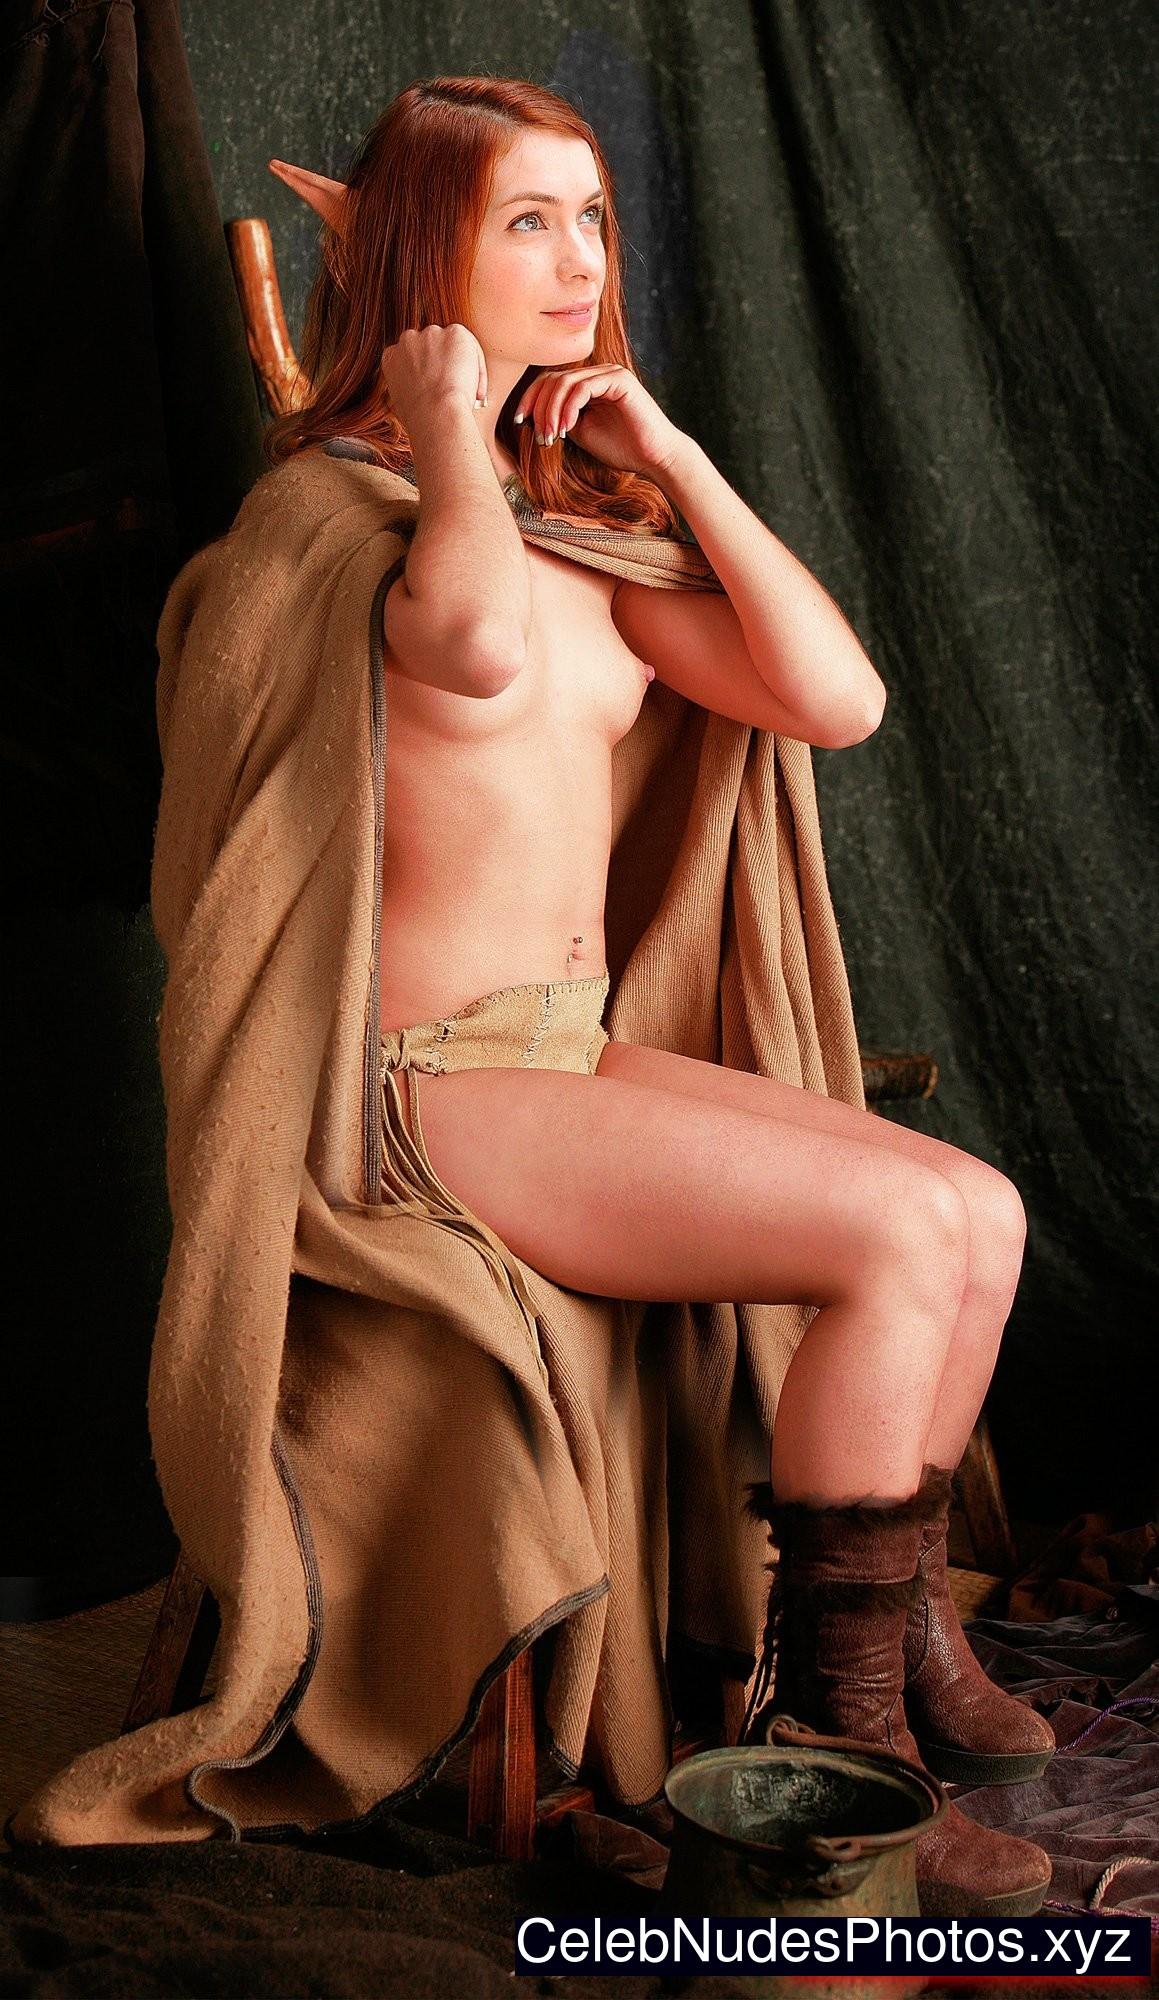 Angie Martinez Nude Pics felicia day fakes - megapornx